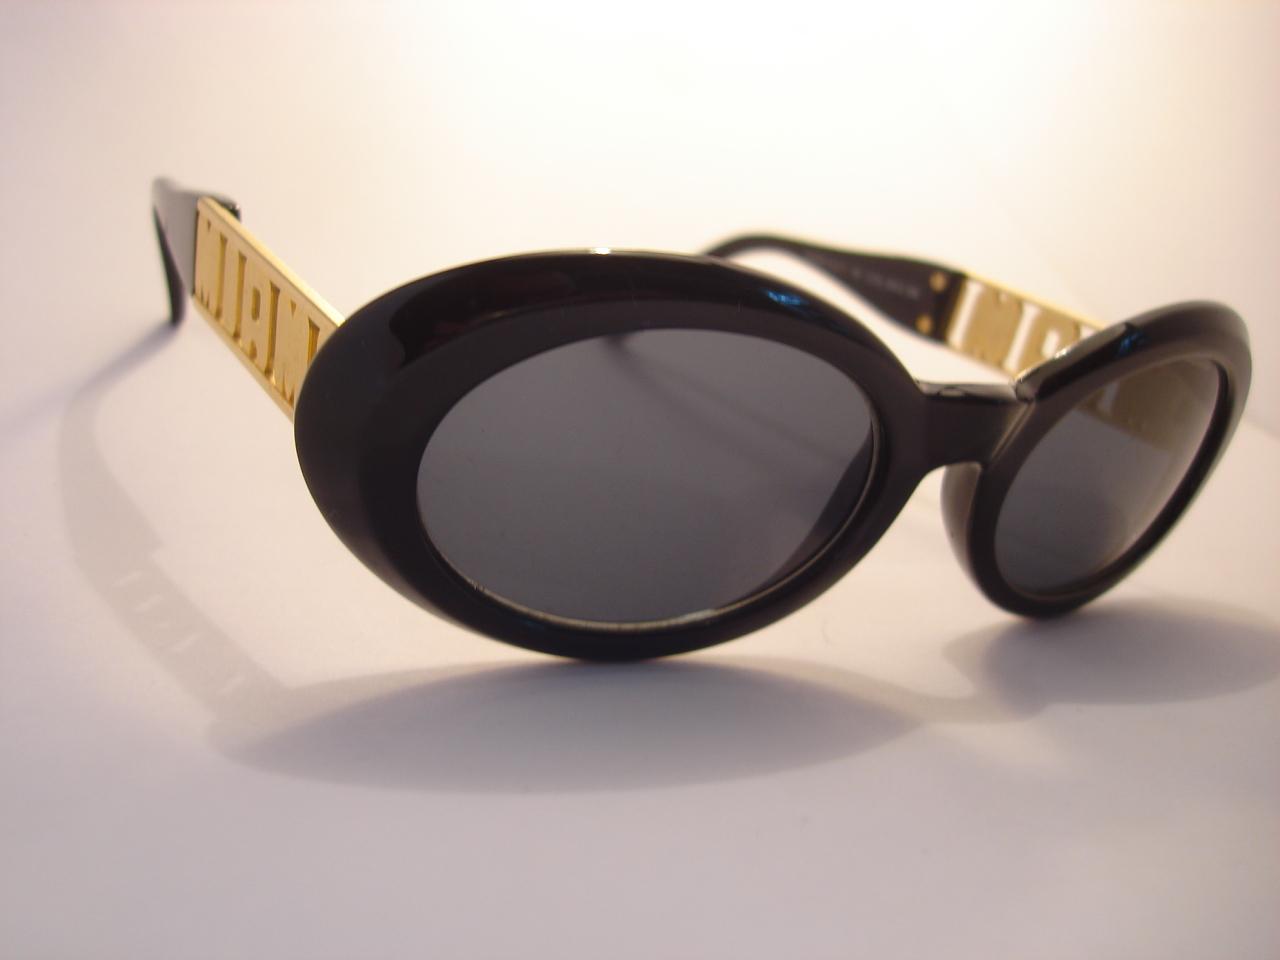 b42b4151487 Vintage Gianni Versace Sunglasses Replica